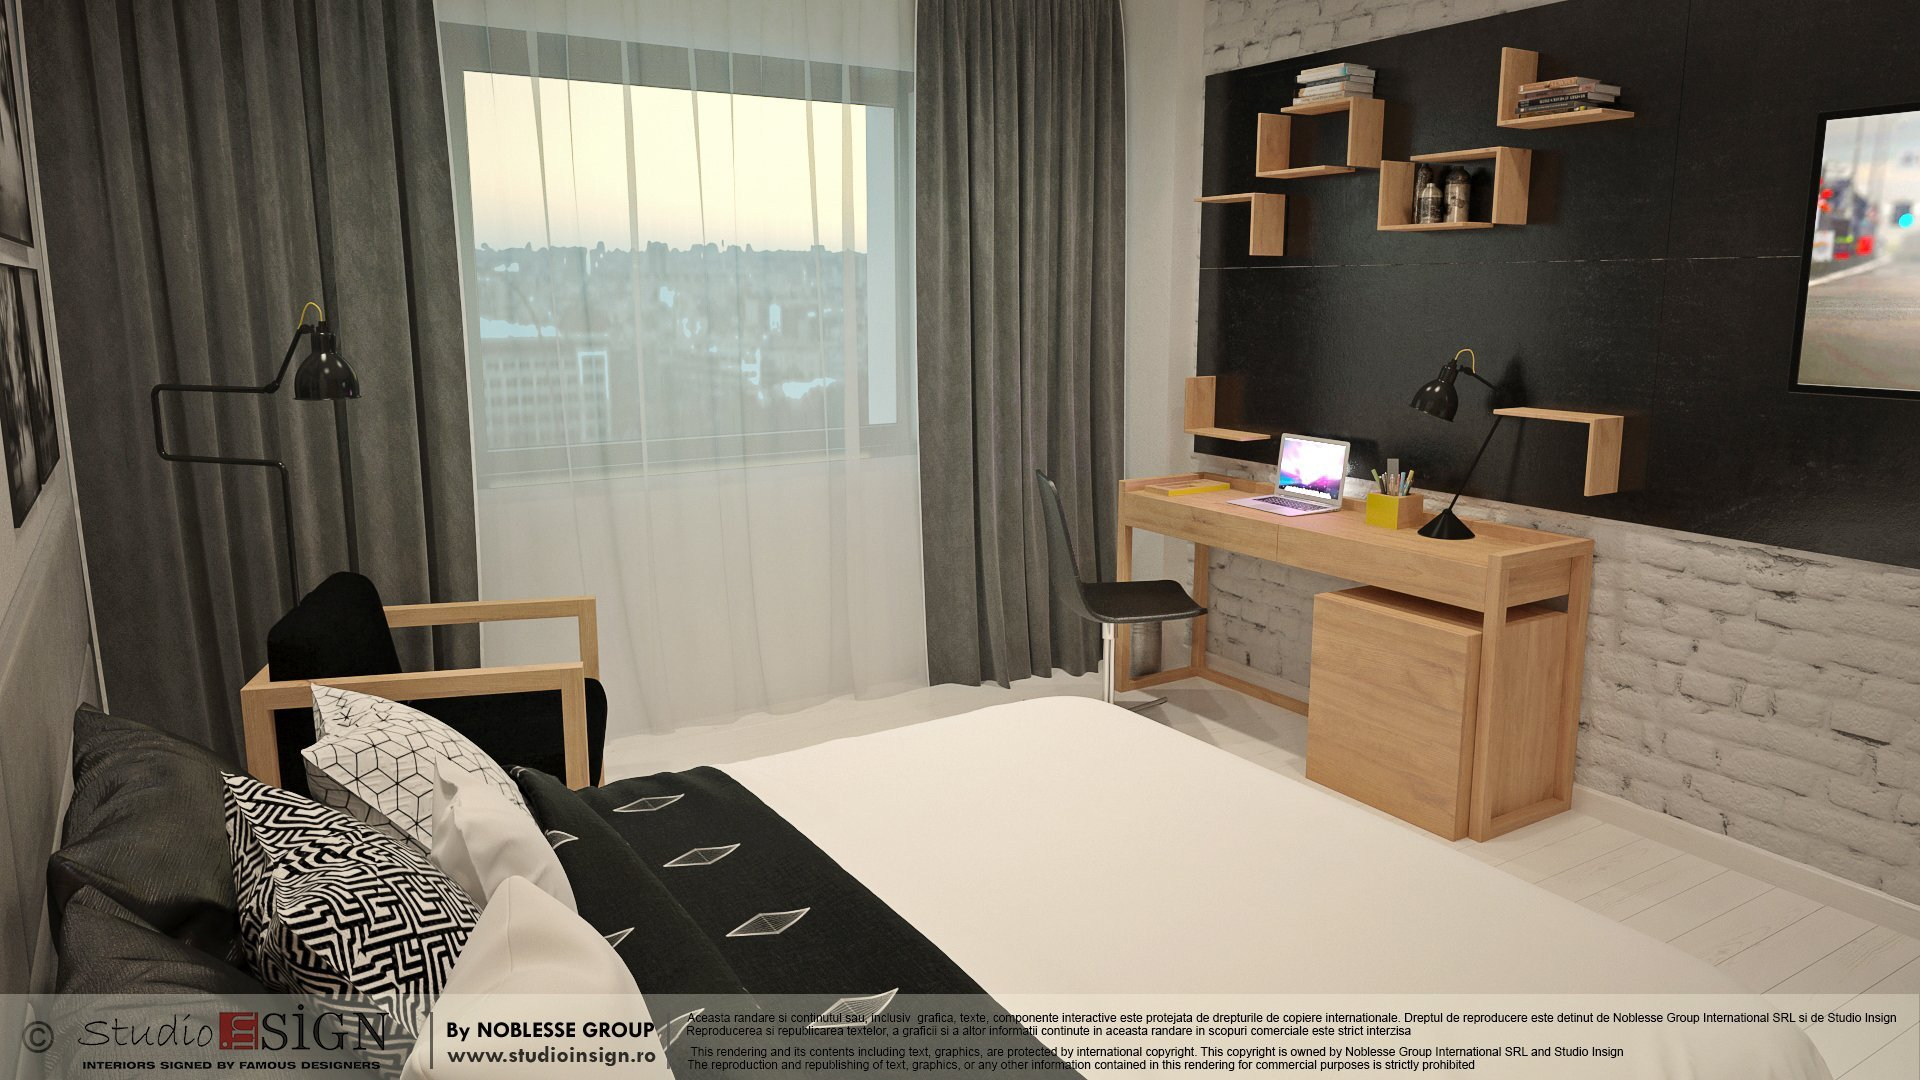 Proiect amenajare camera hotel in stil loft industrial newyorkez-seara-3